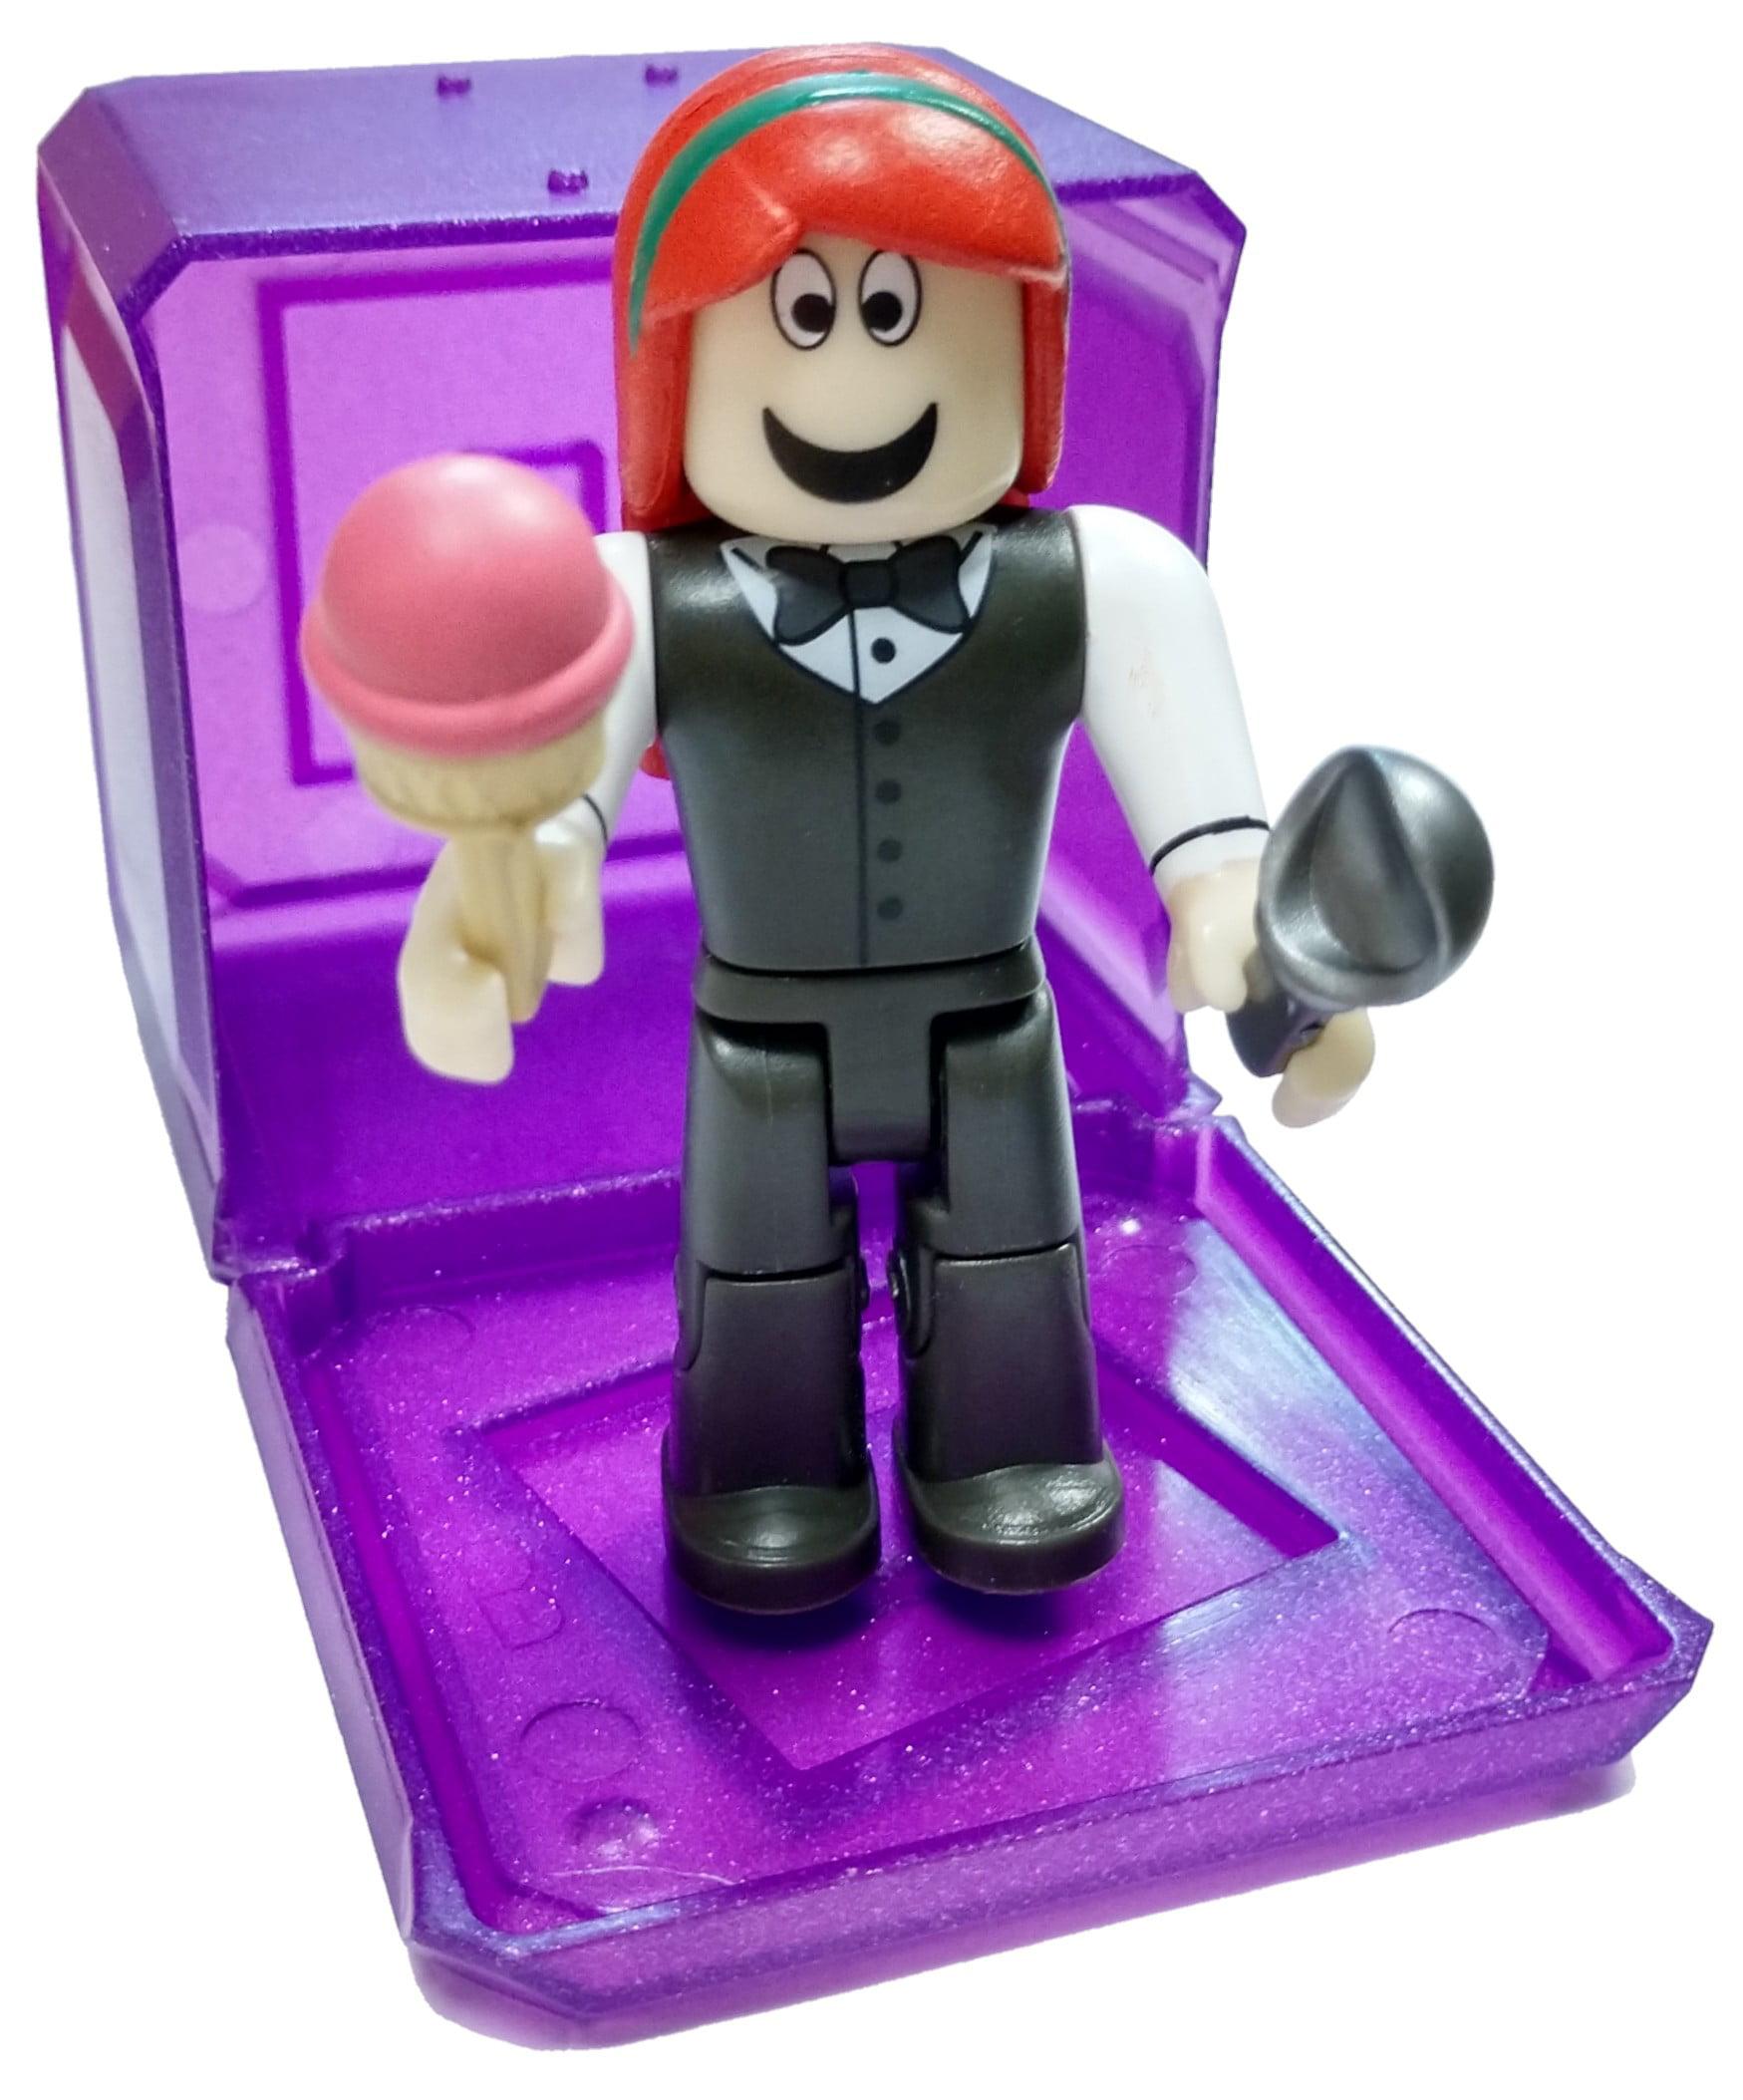 Roblox Celebrity Collection Series 3 Meepcity Ice Cream Seller